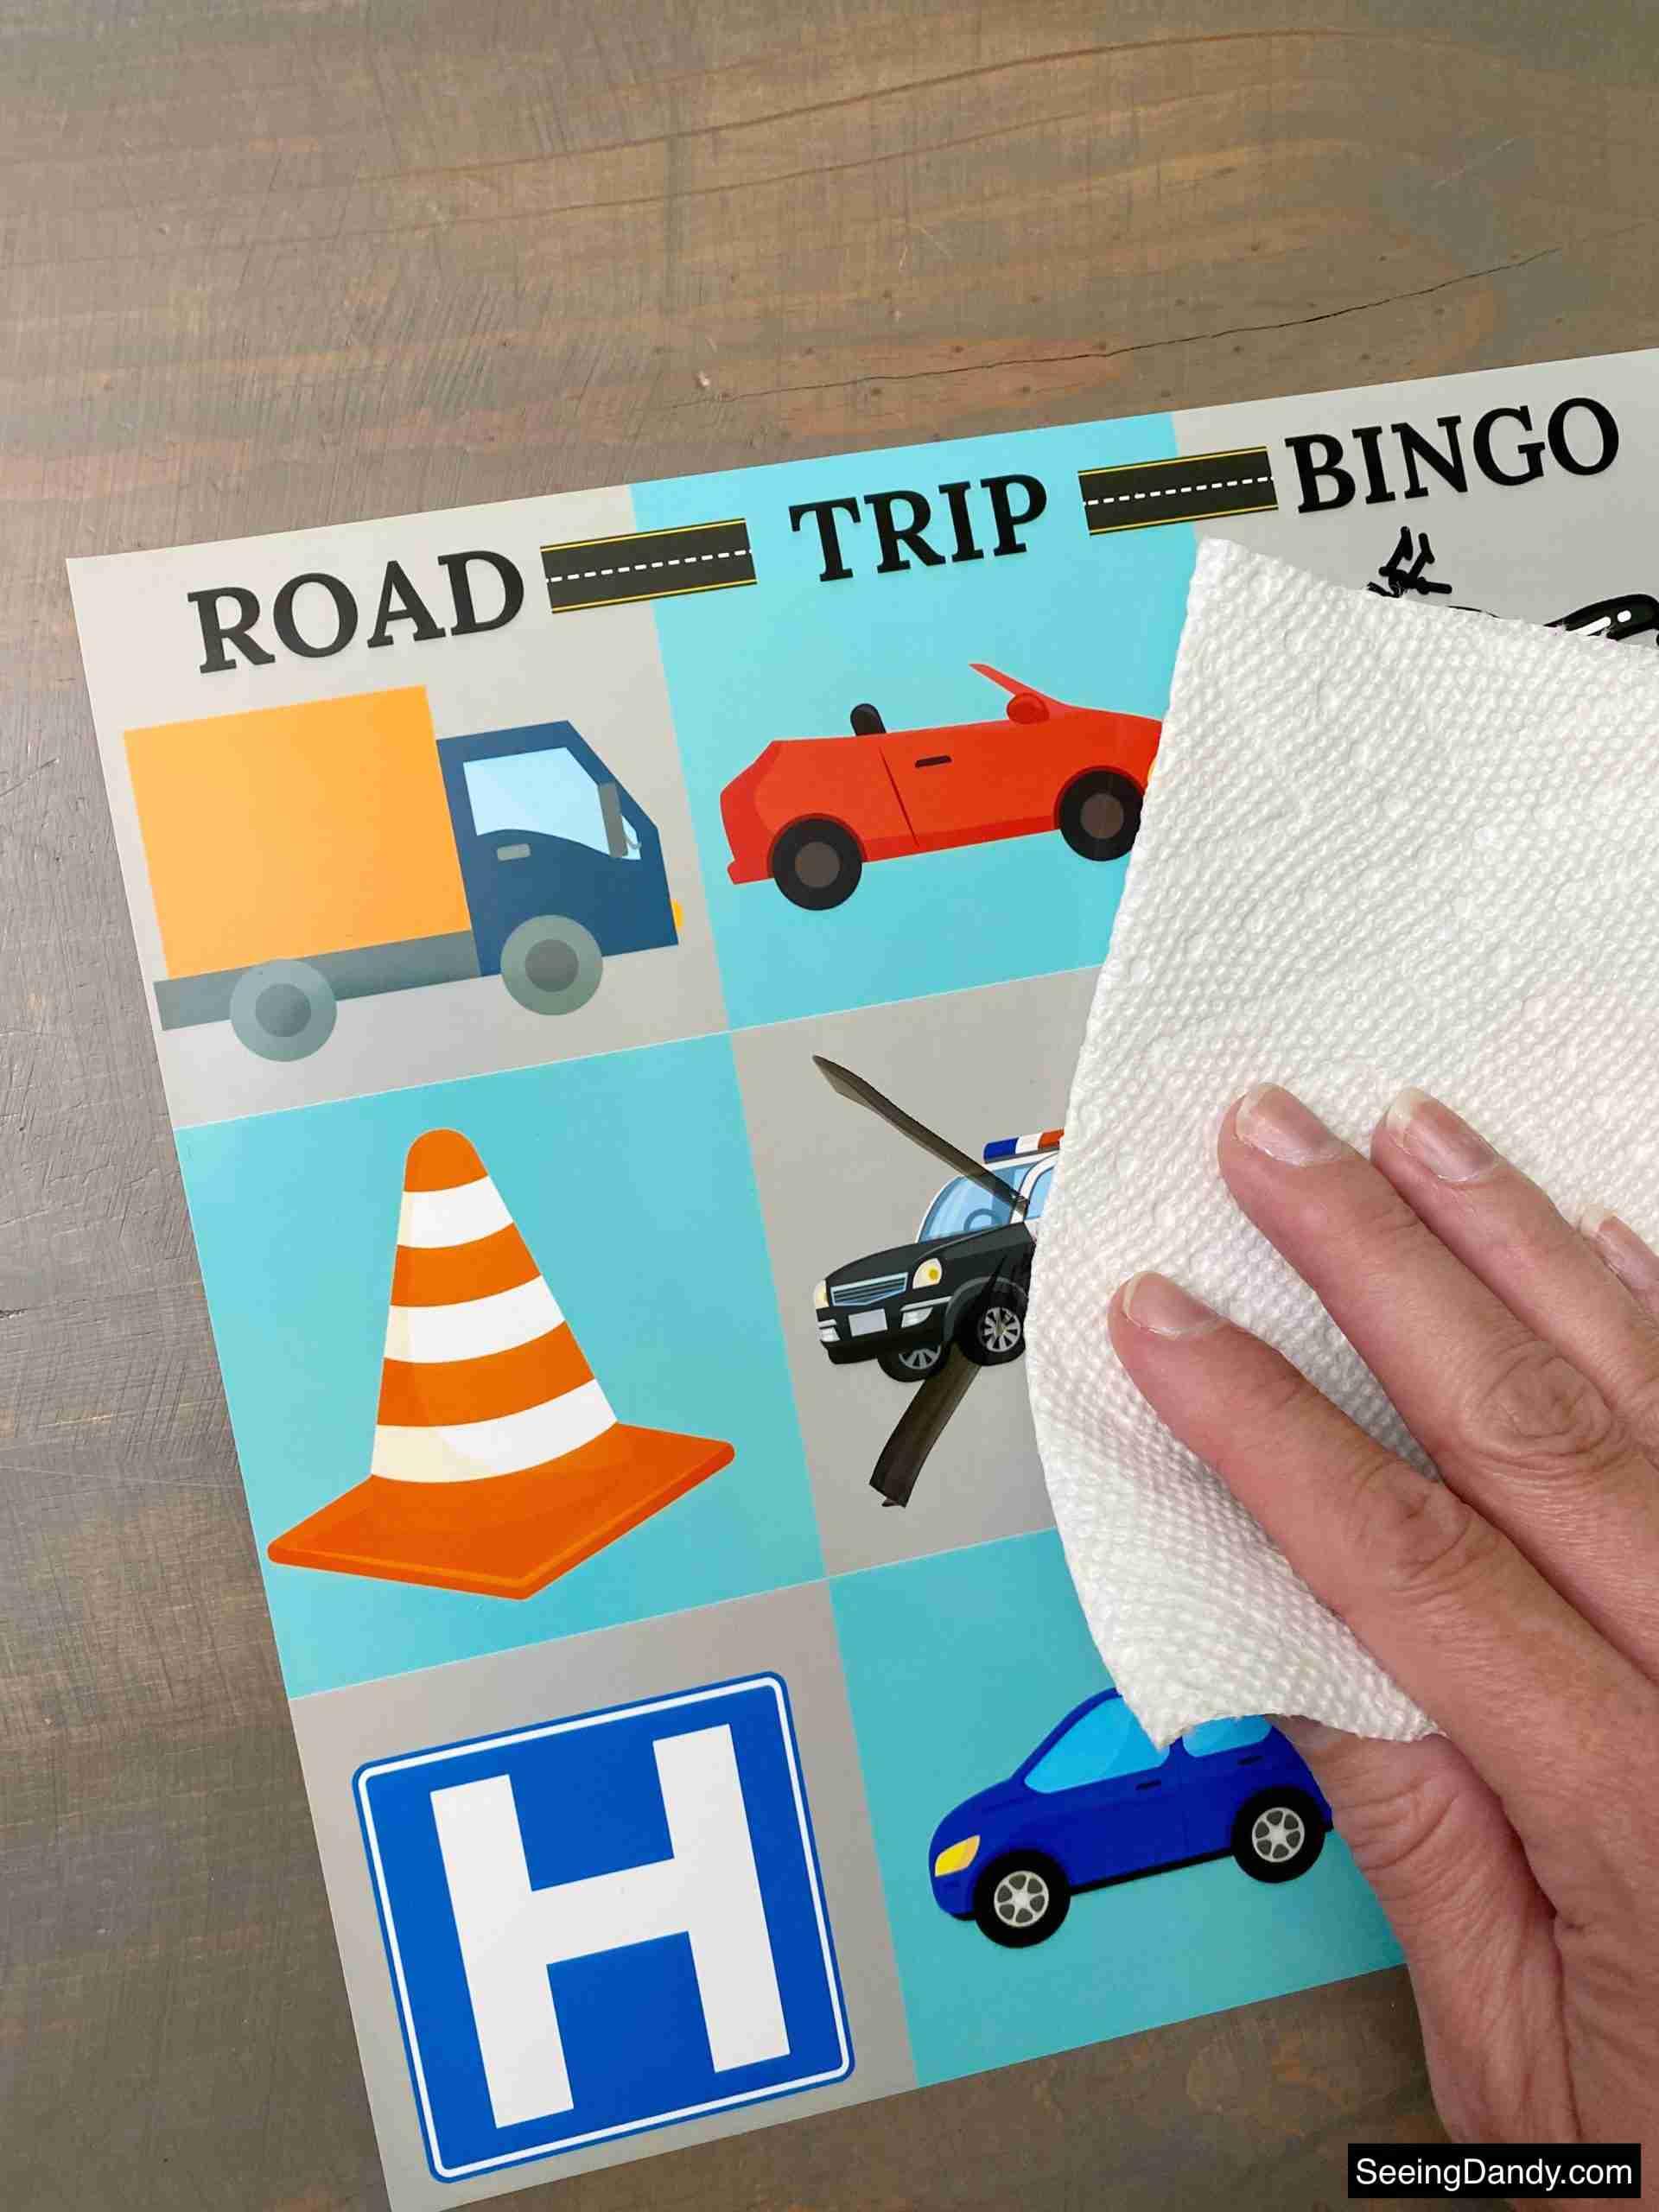 road trip bingo printable, dry erase bingo card, travel bingo, family travel, family vacation, road trip vacation, cross country travel